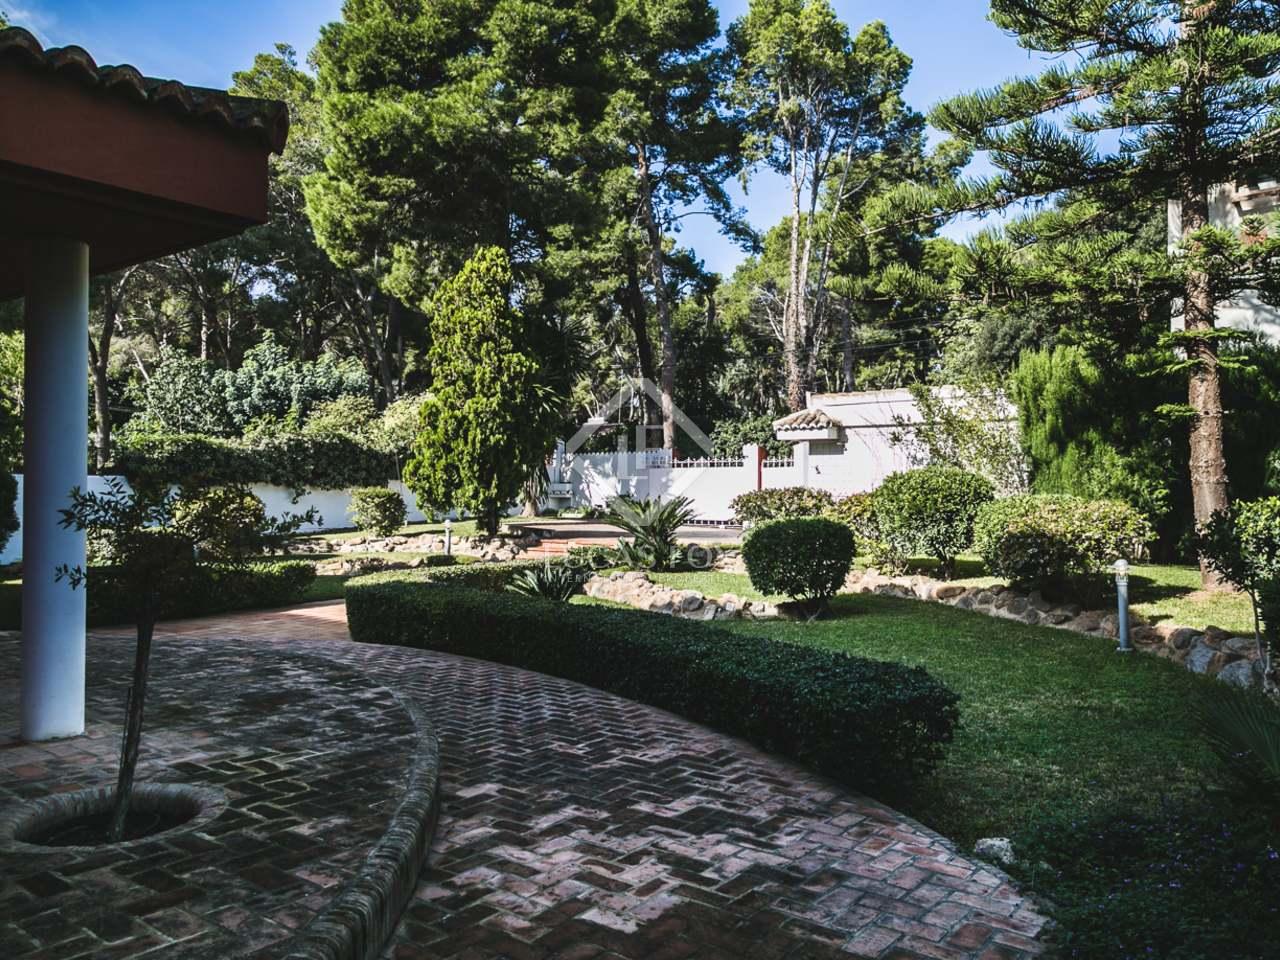 Villa con piscina en venta en campolivar valencia for Piscina jardin valencia